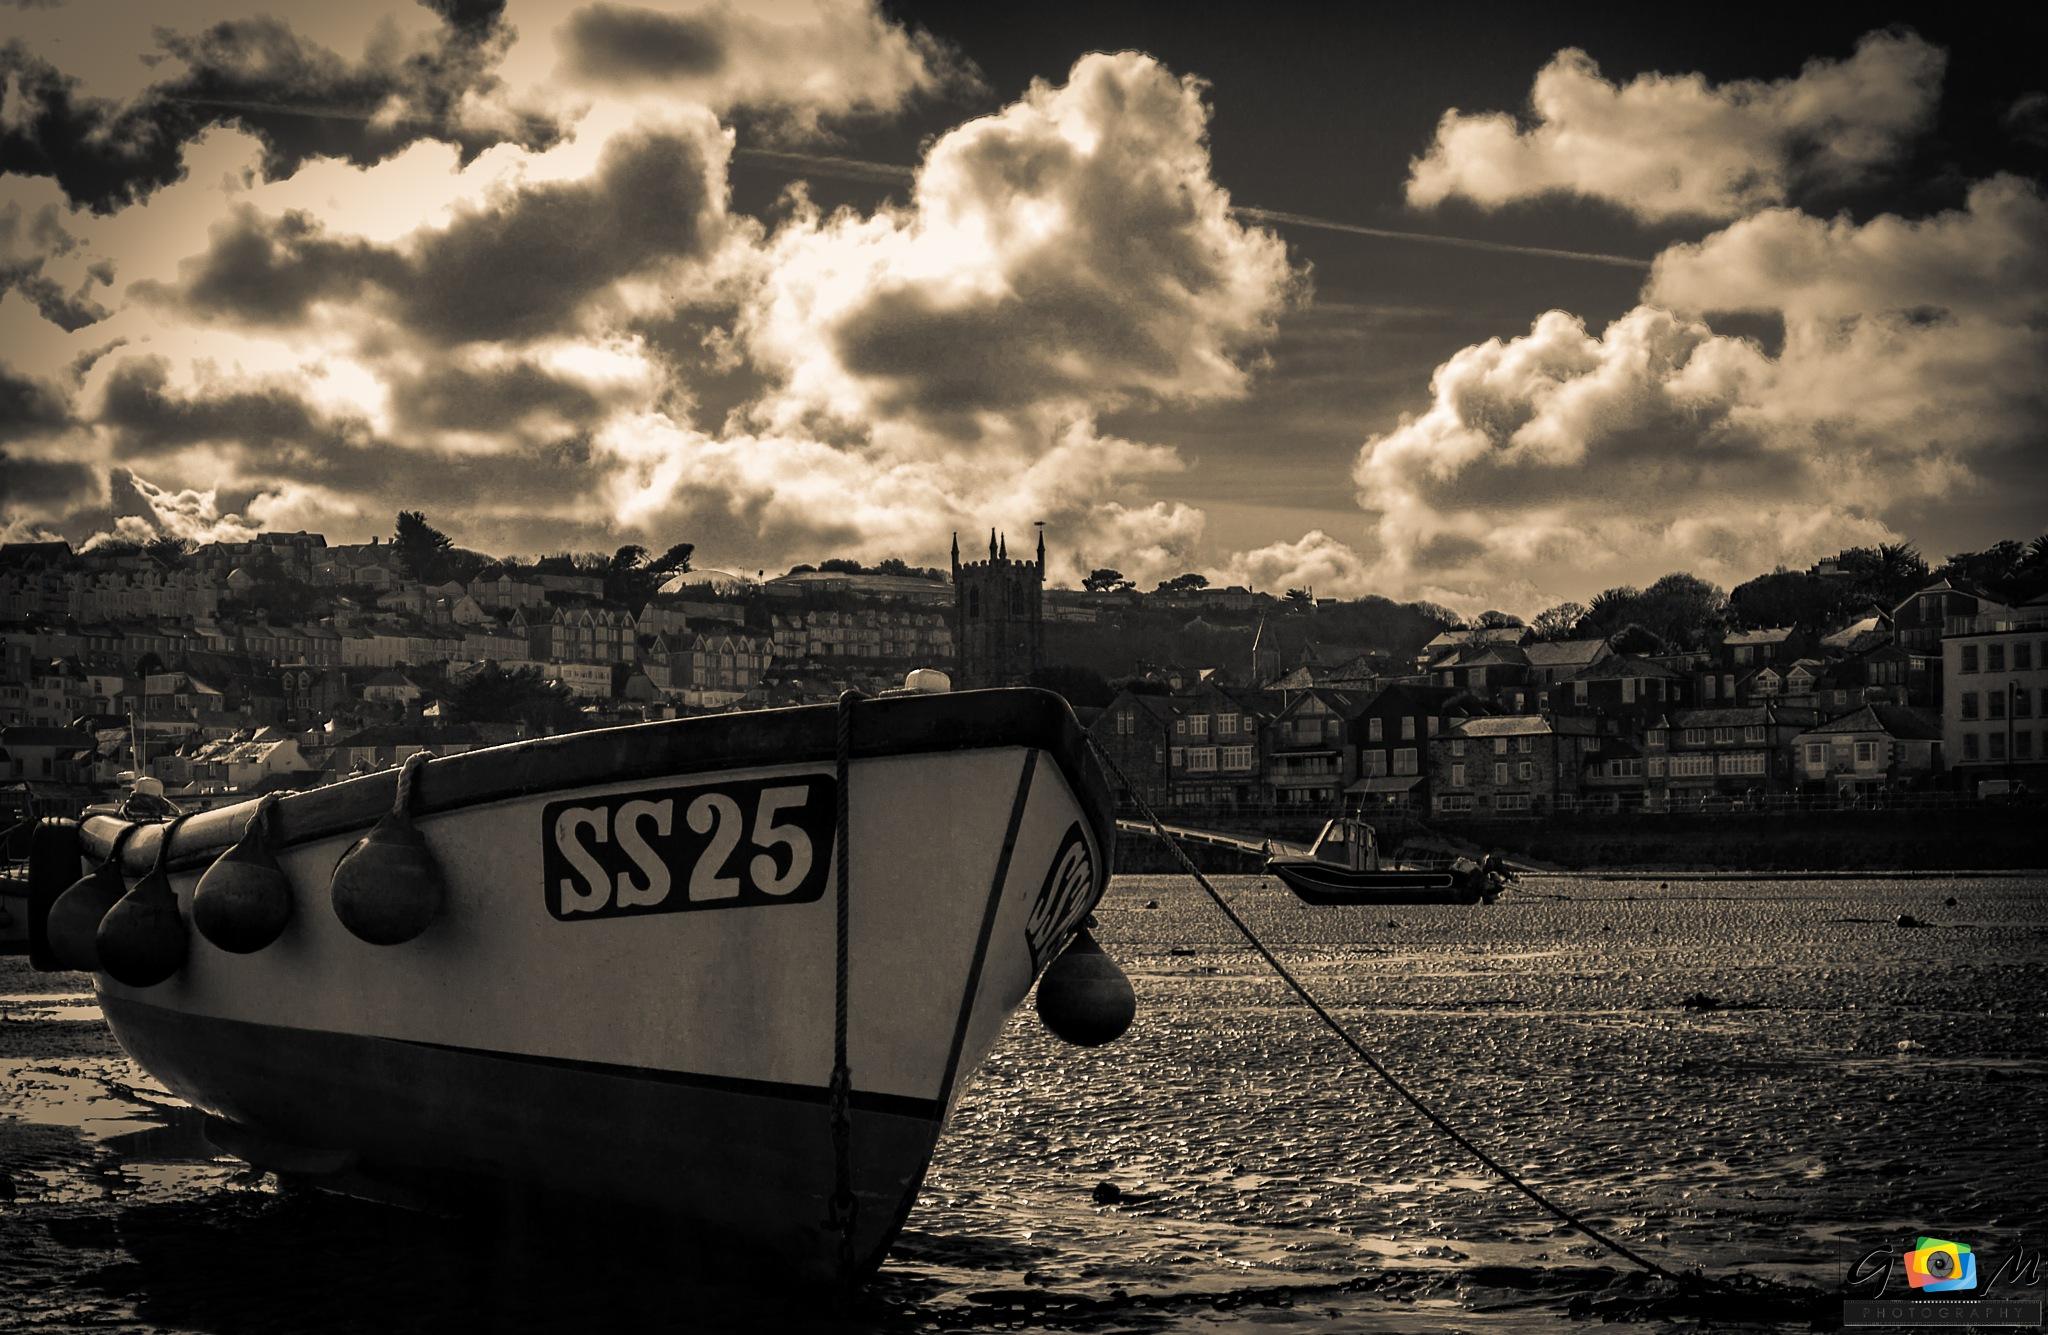 tides out by Graeme Mathieson